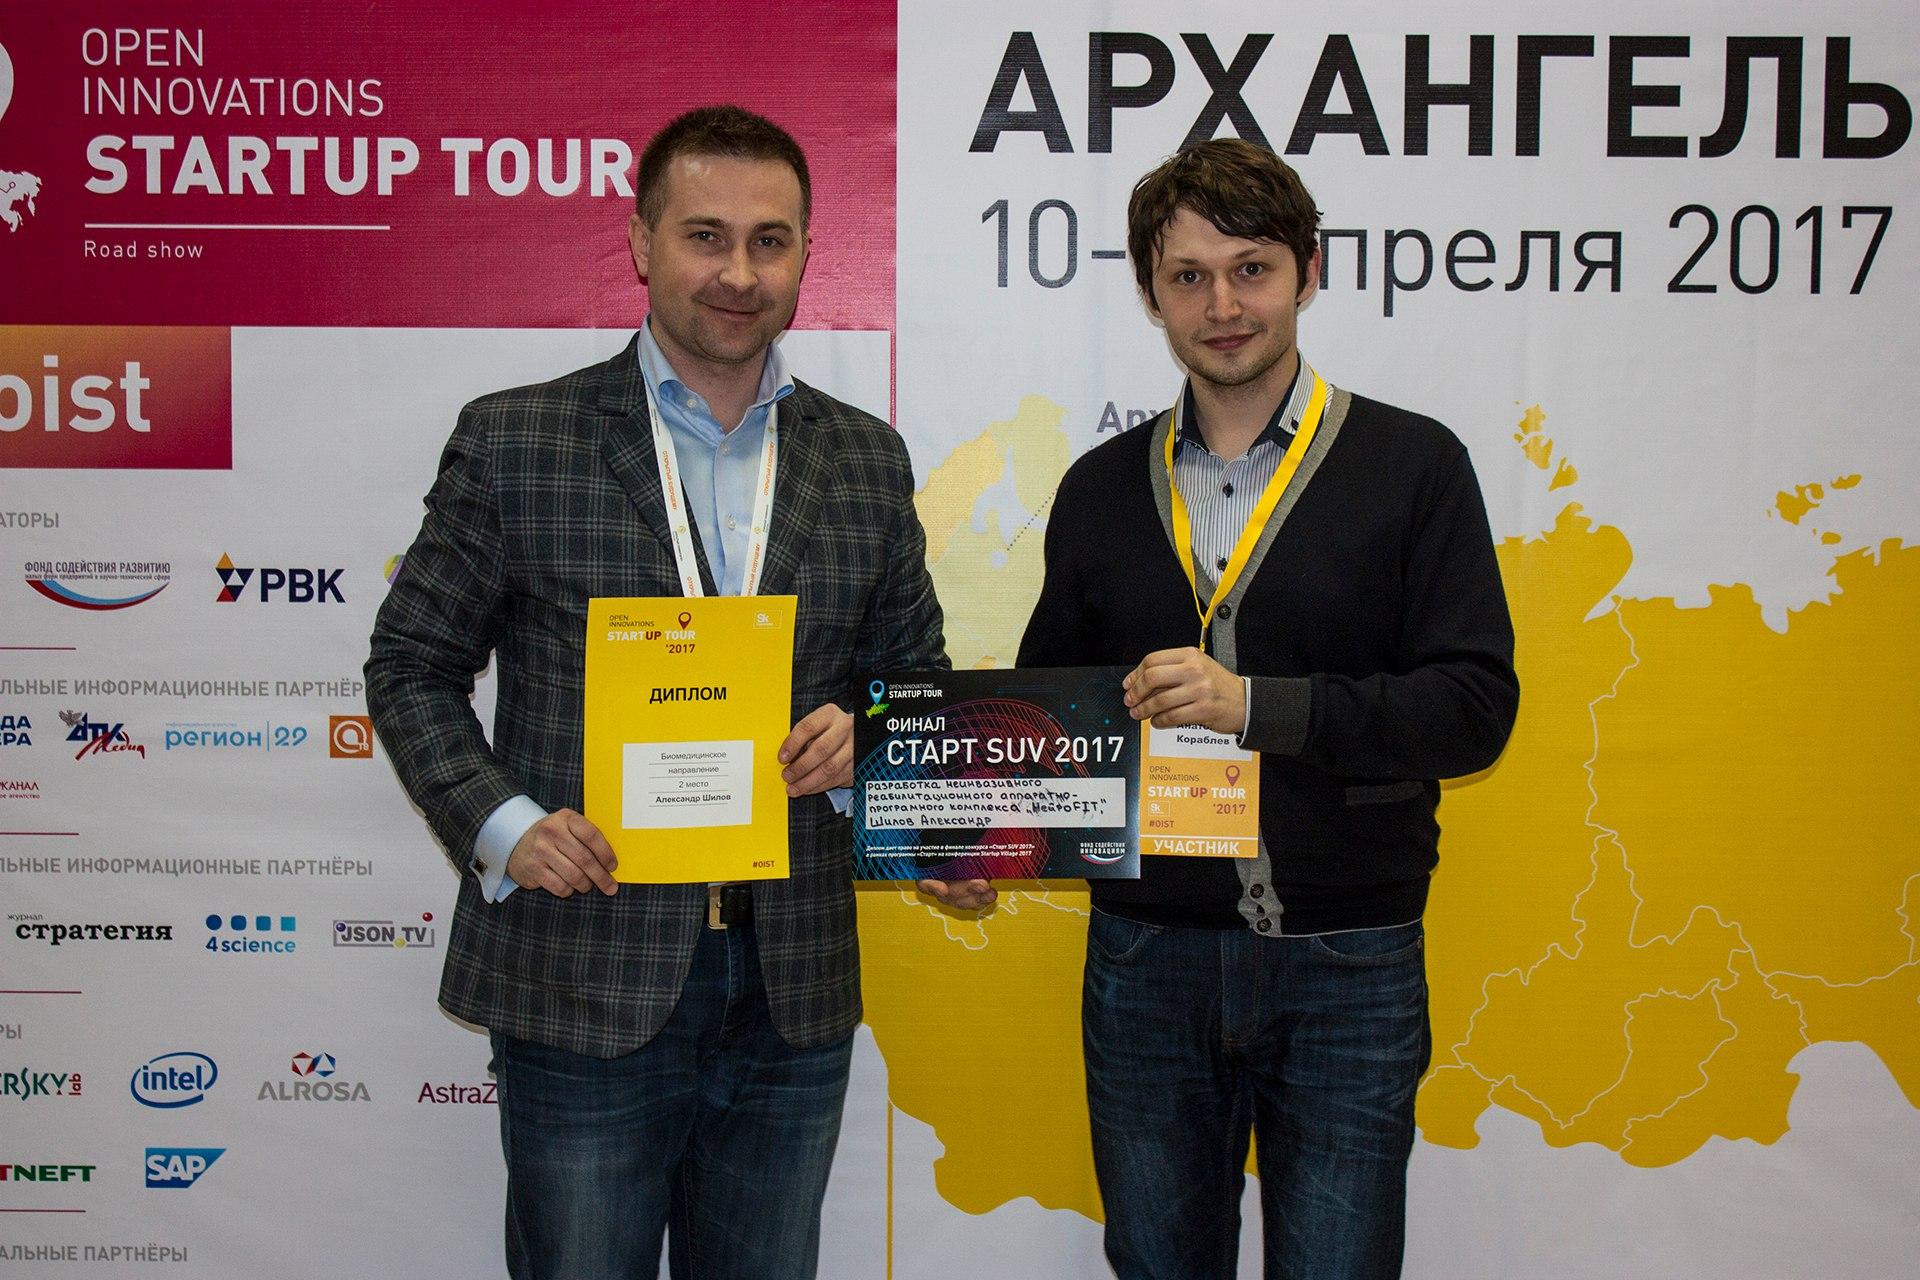 Александр Шилов, Анатолий Кораблев на Startup Tour